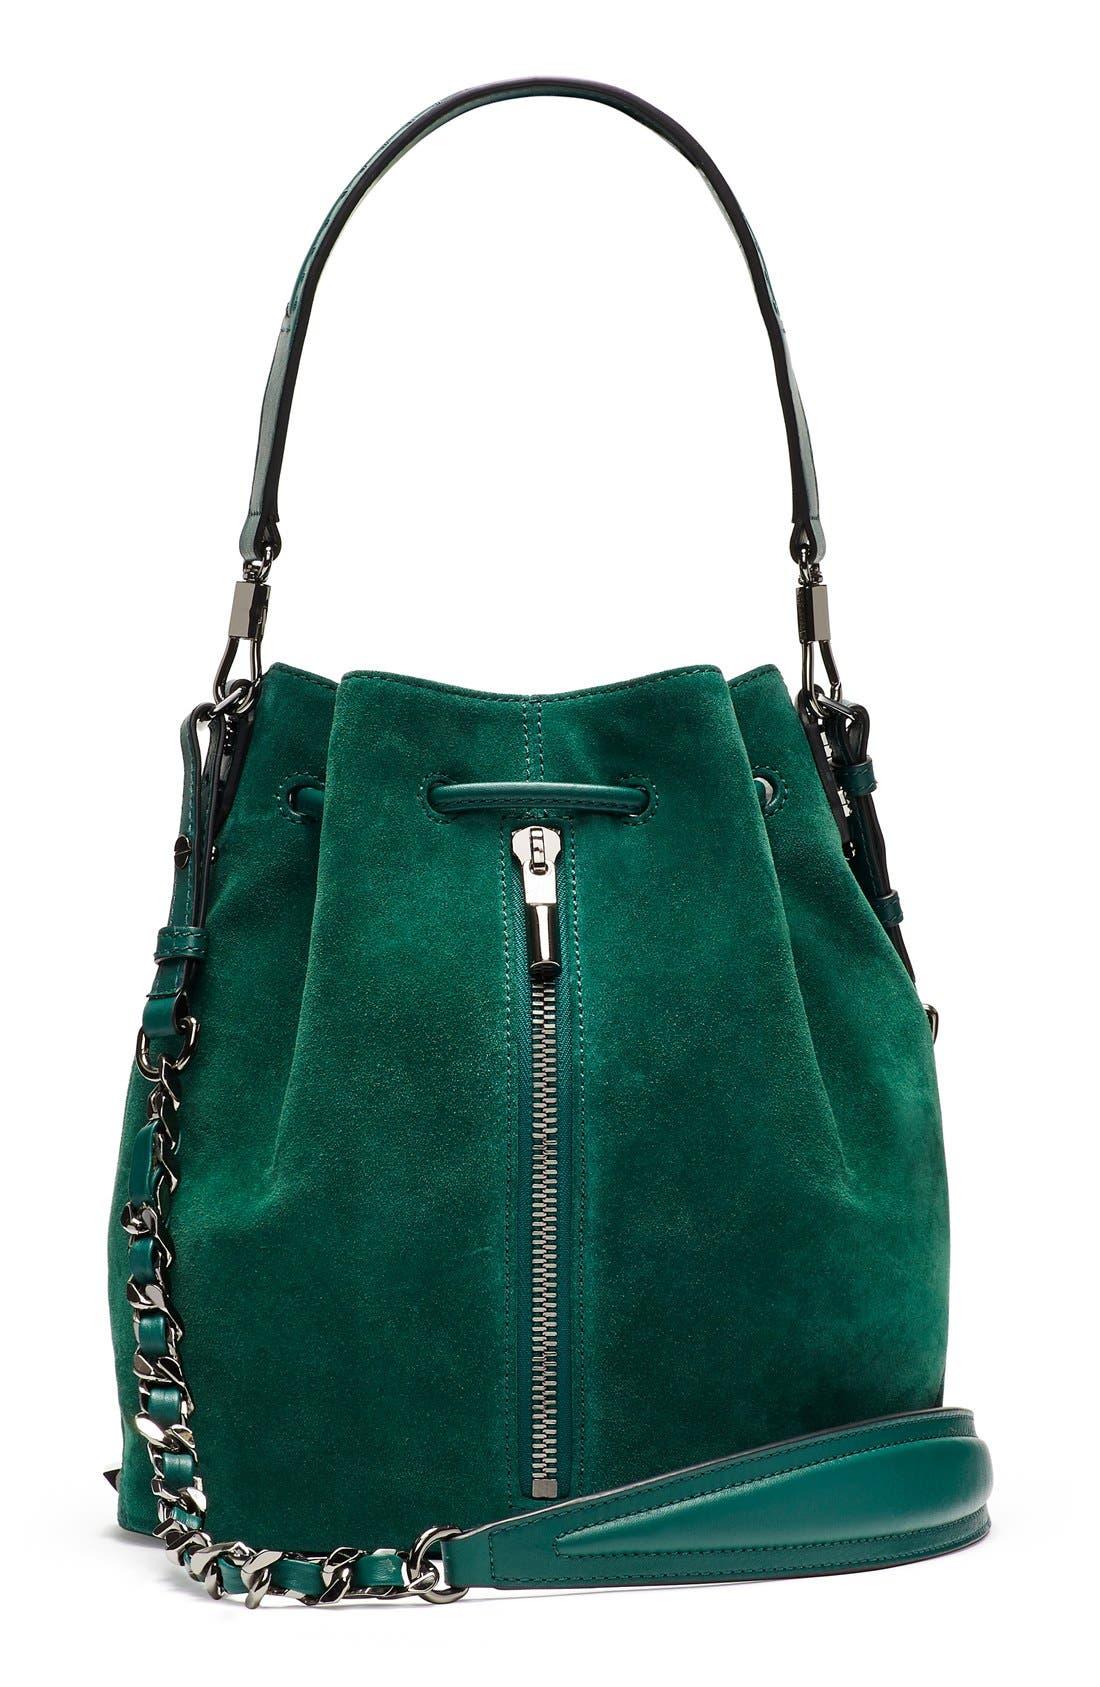 Alternate Image 1 Selected - Elizabeth and James 'Cynnie' Suede Bucket Bag